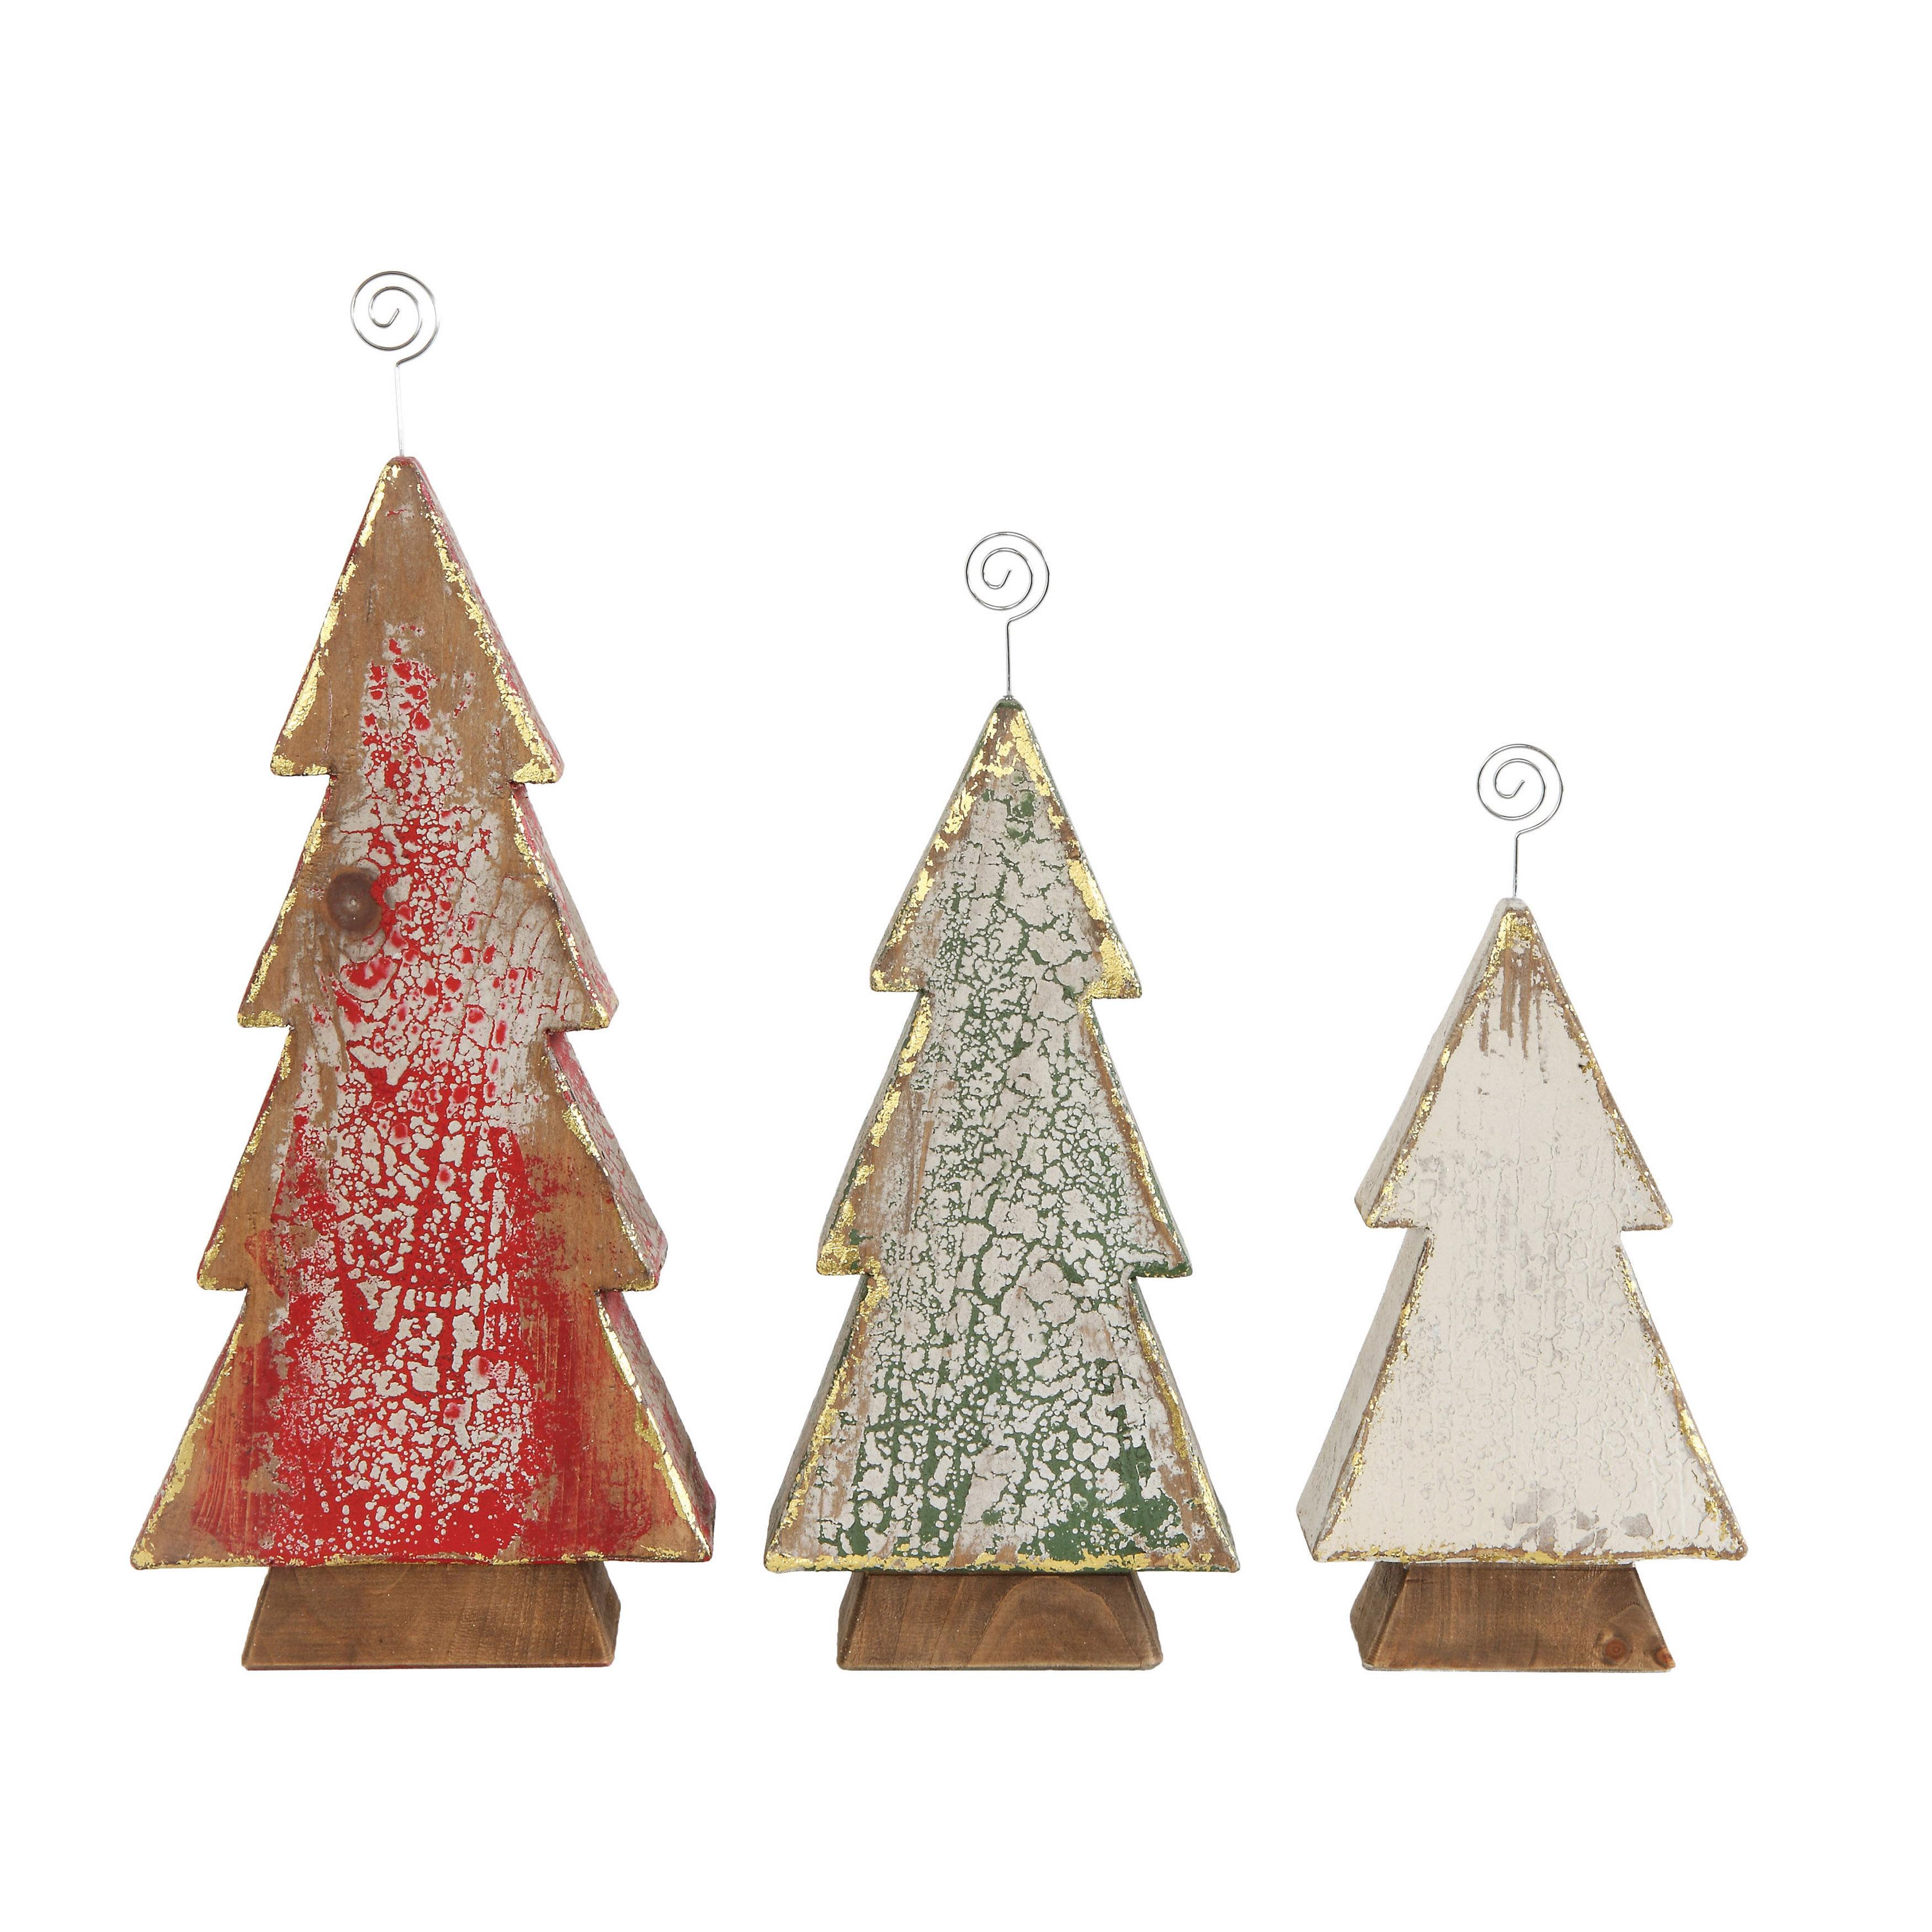 The Holiday Aisle Wood Tree 3 Piece Place Card Holder Set | Wayfair